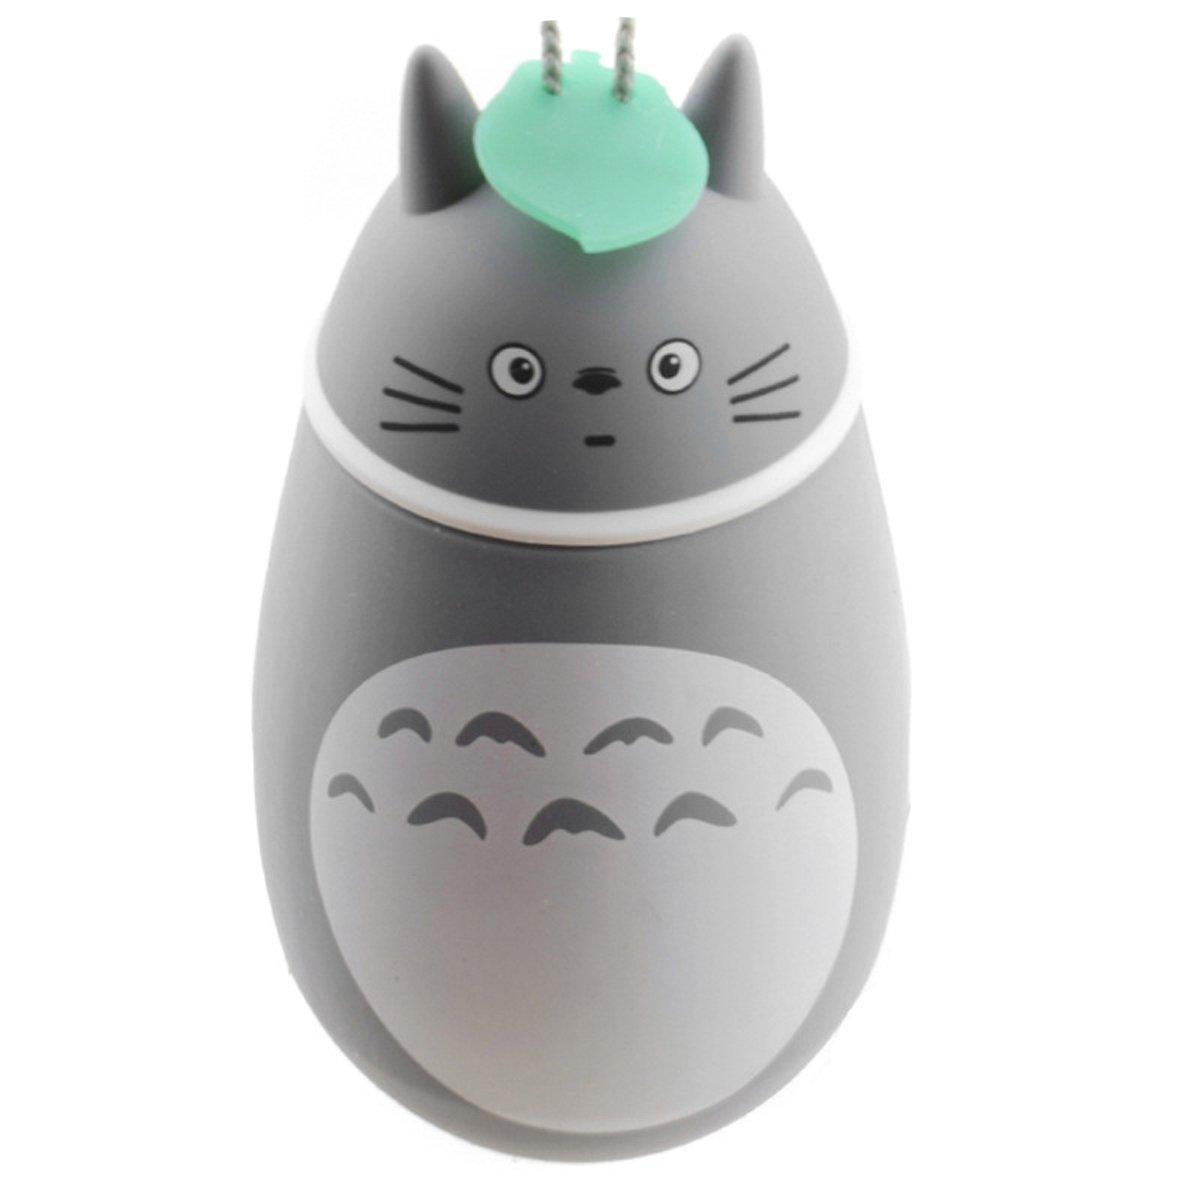 Stardice Cute Totoro Thermos / Travel Mug - 280 ML (silent) by STARDICE stmug 1154